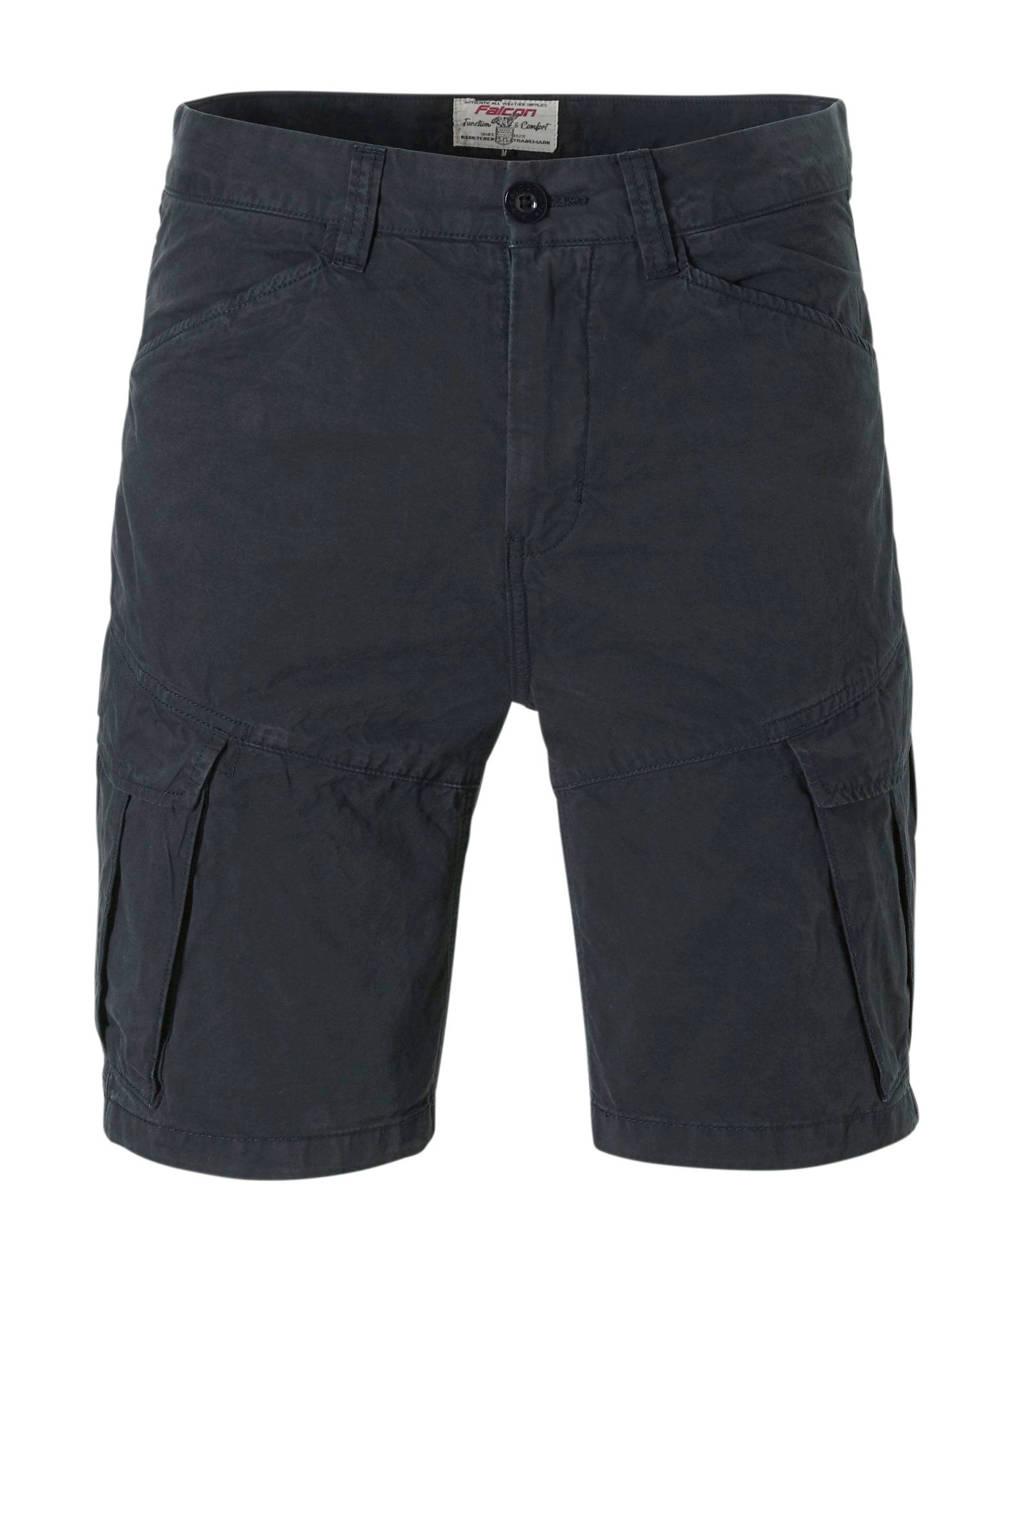 Falcon outdoor short donkerblauw, Donkerblauw